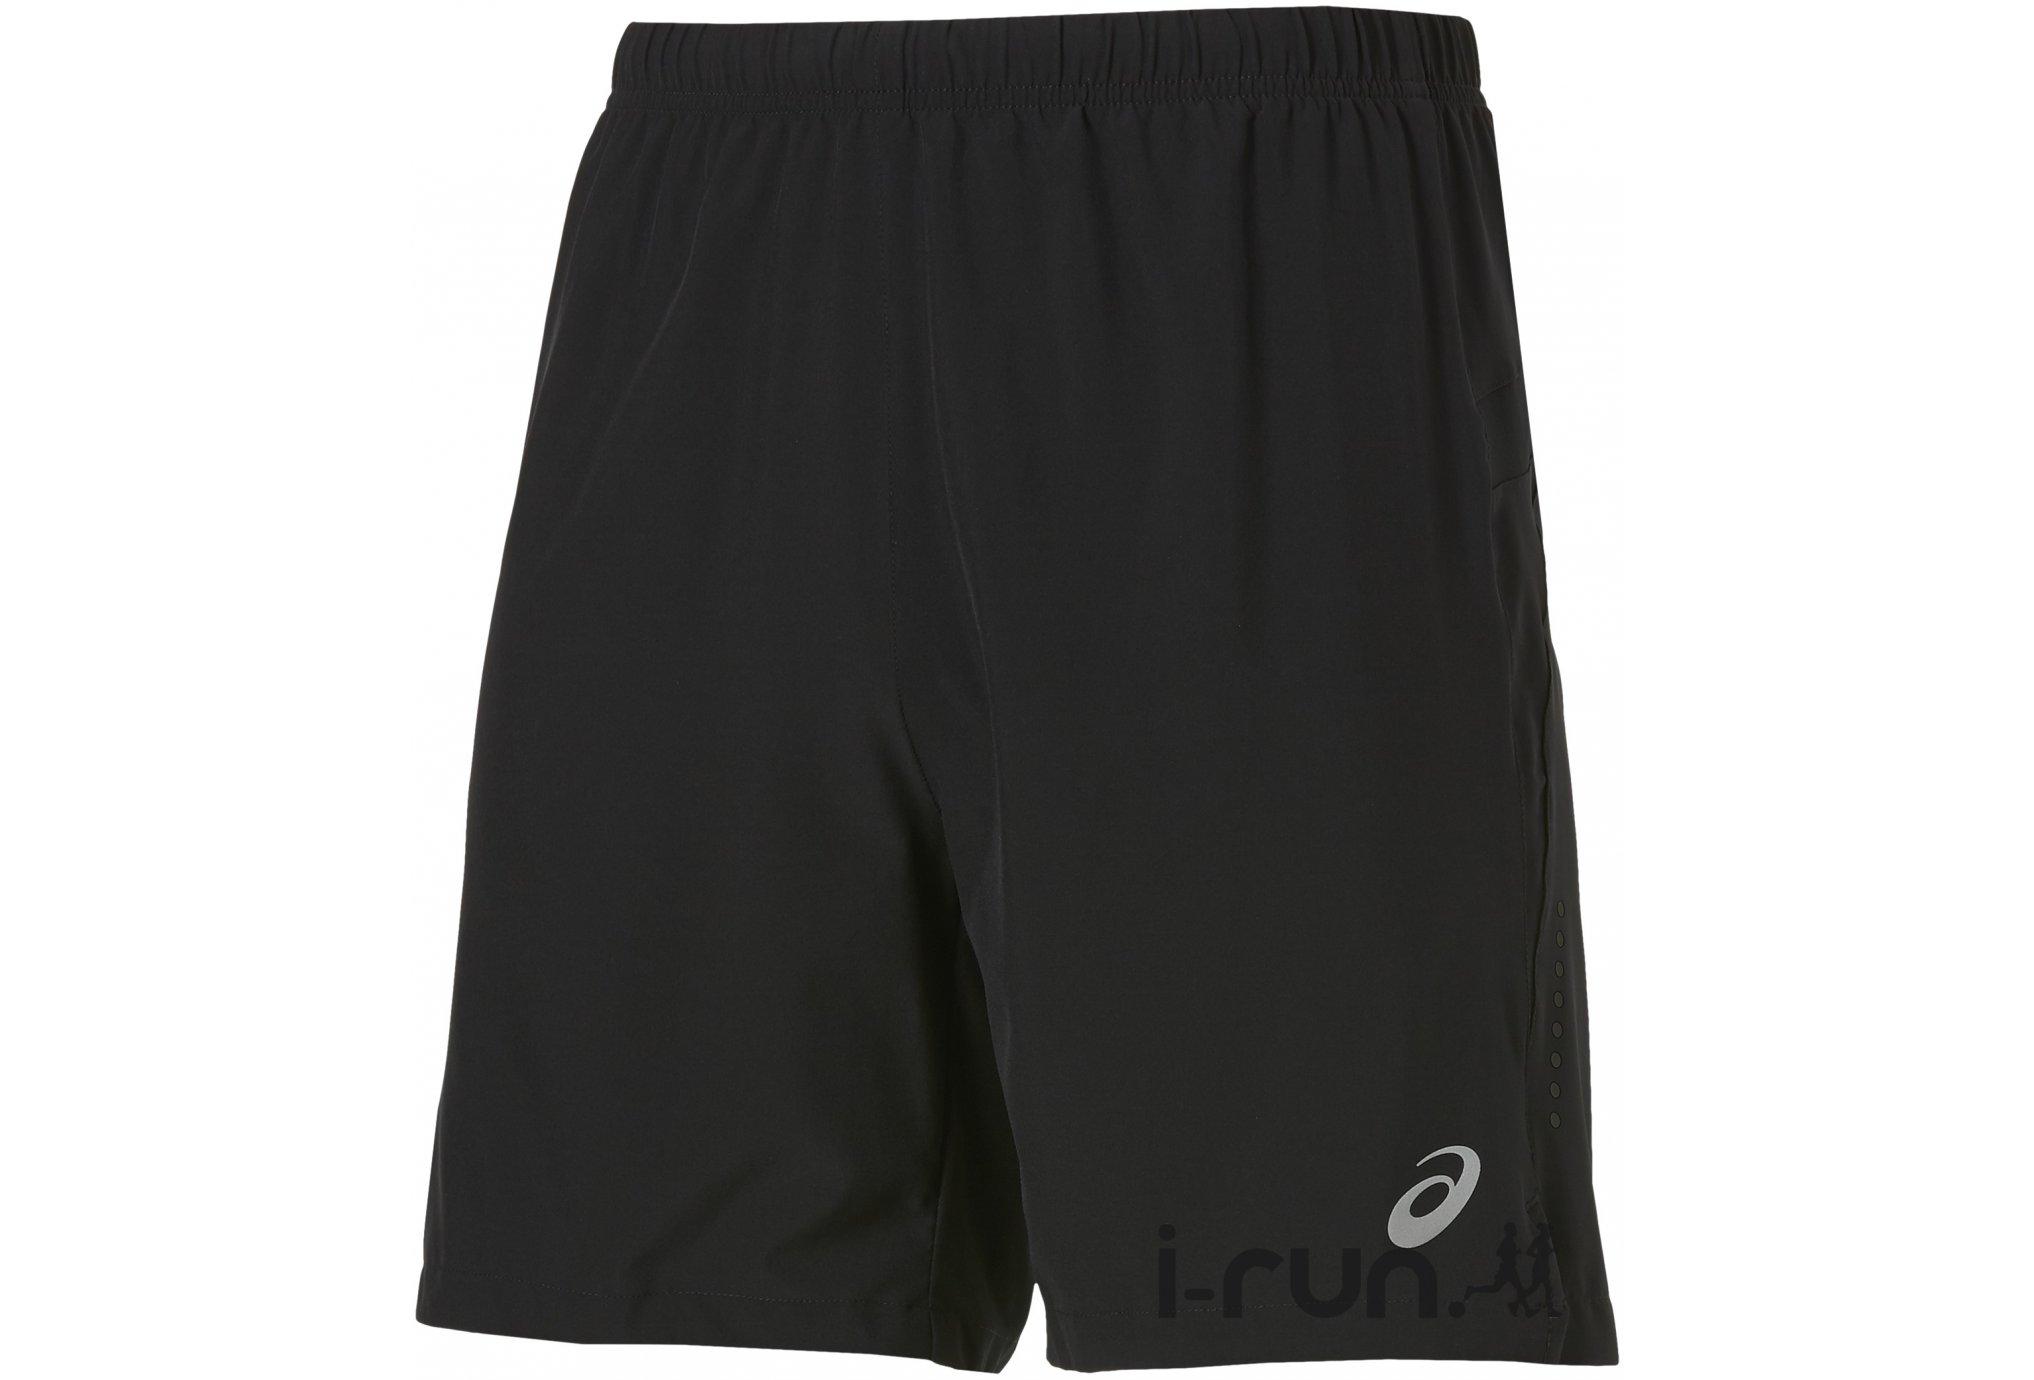 Asics Short Woven 7 Inch M vêtement running homme